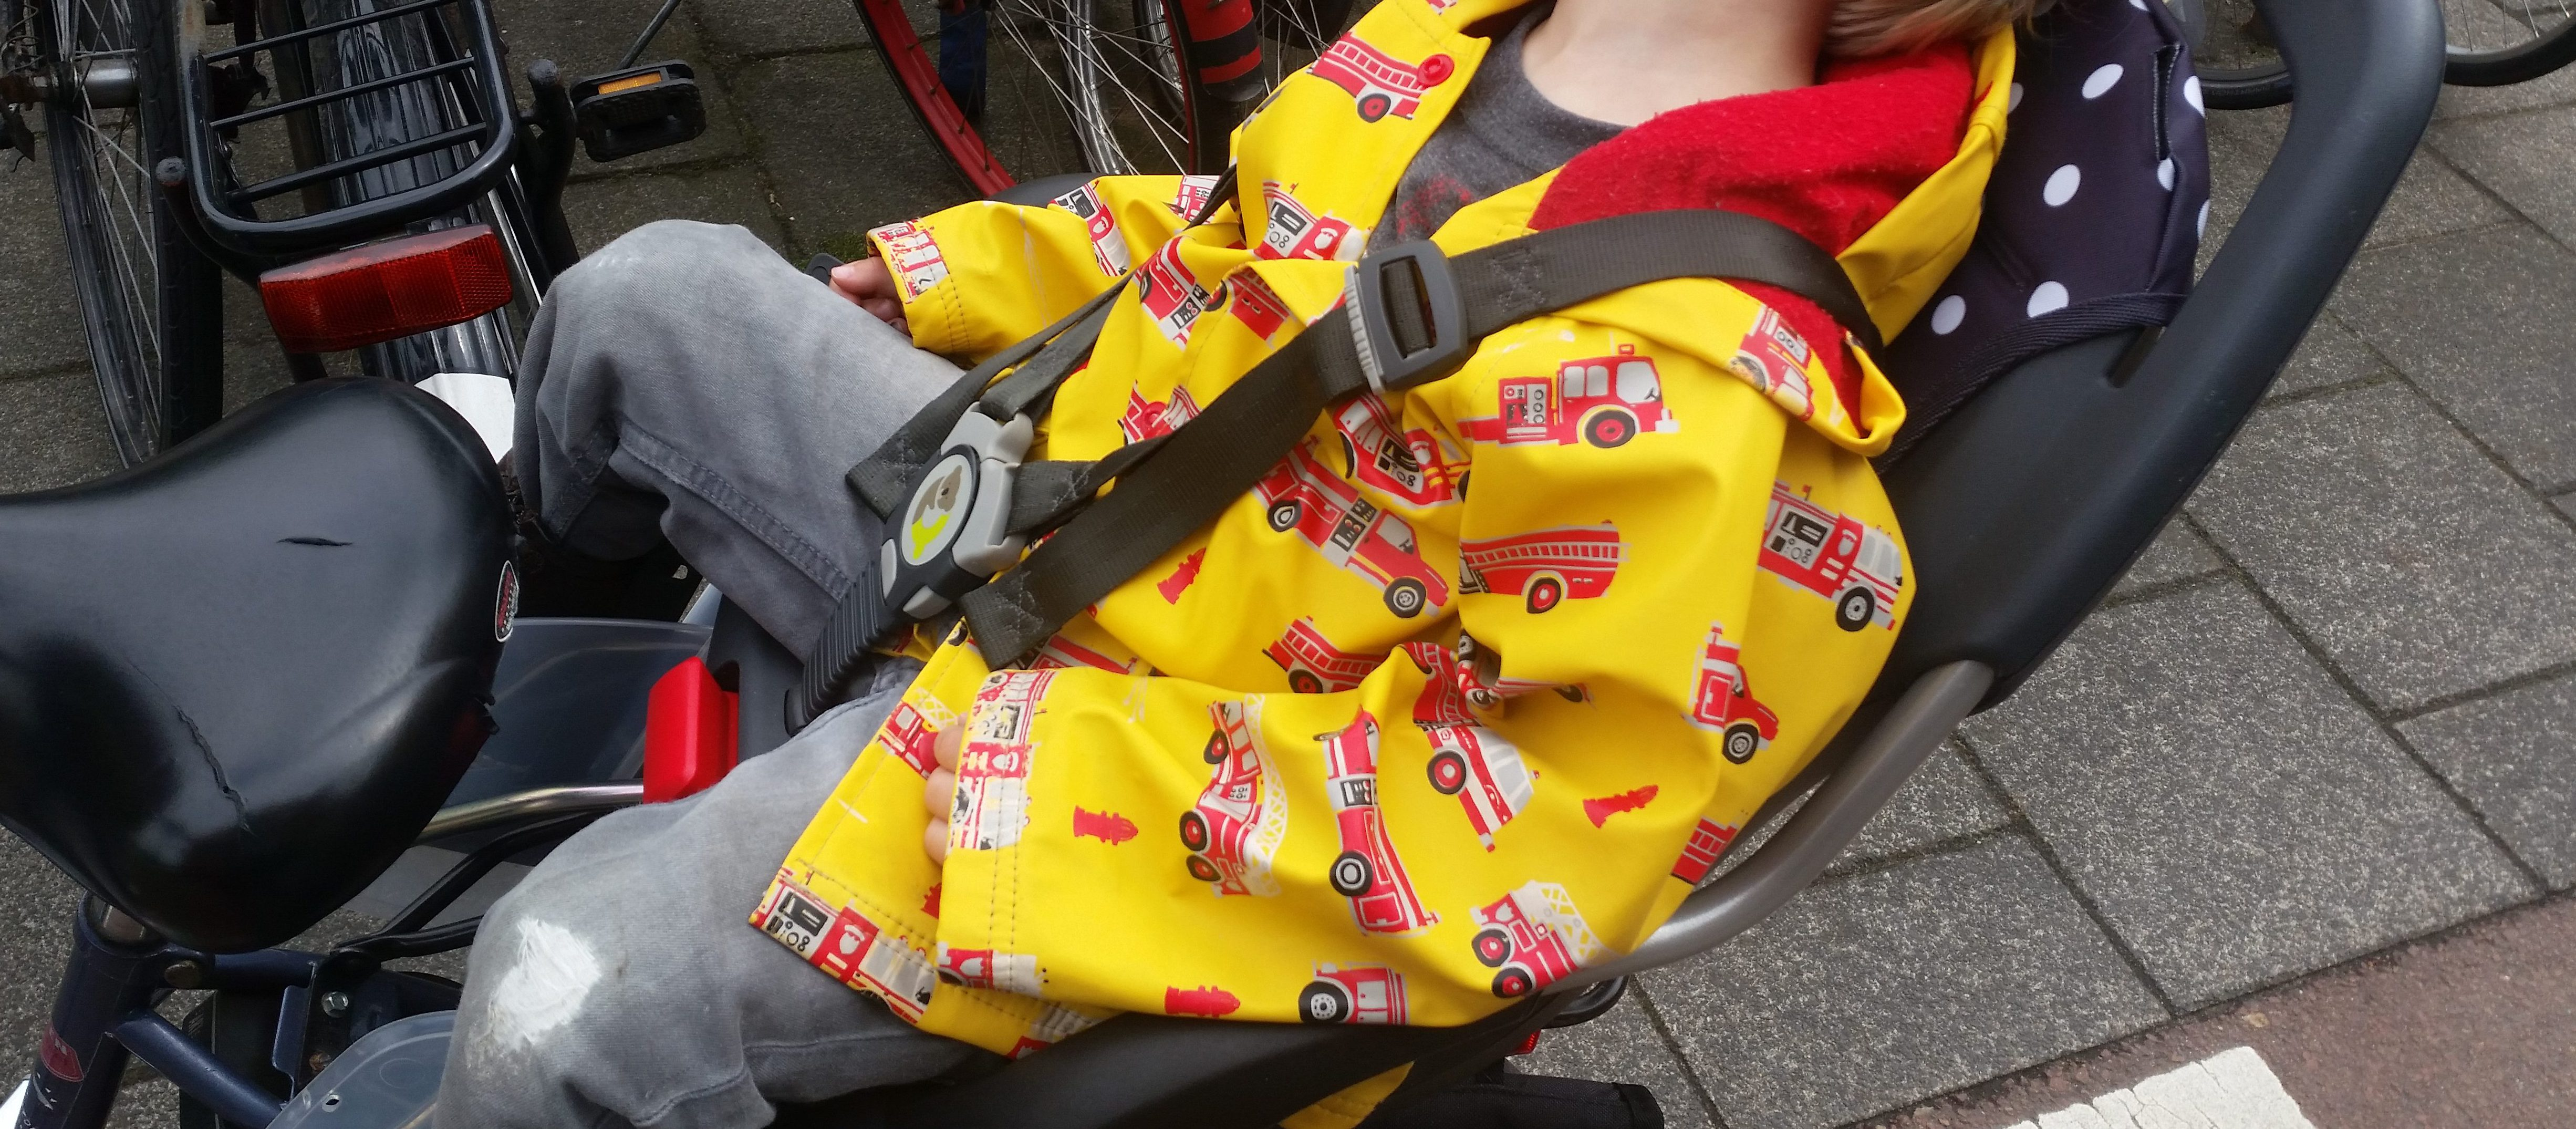 7-16-qibbel-fietszitje-fietsen-baby-kind-fietsstoeltje-achter-ligstand-liggen-slapen-regen-handig-bekleding-mooi-stevig-montage-monteren-nanny-moeder-amsterdam-slapen